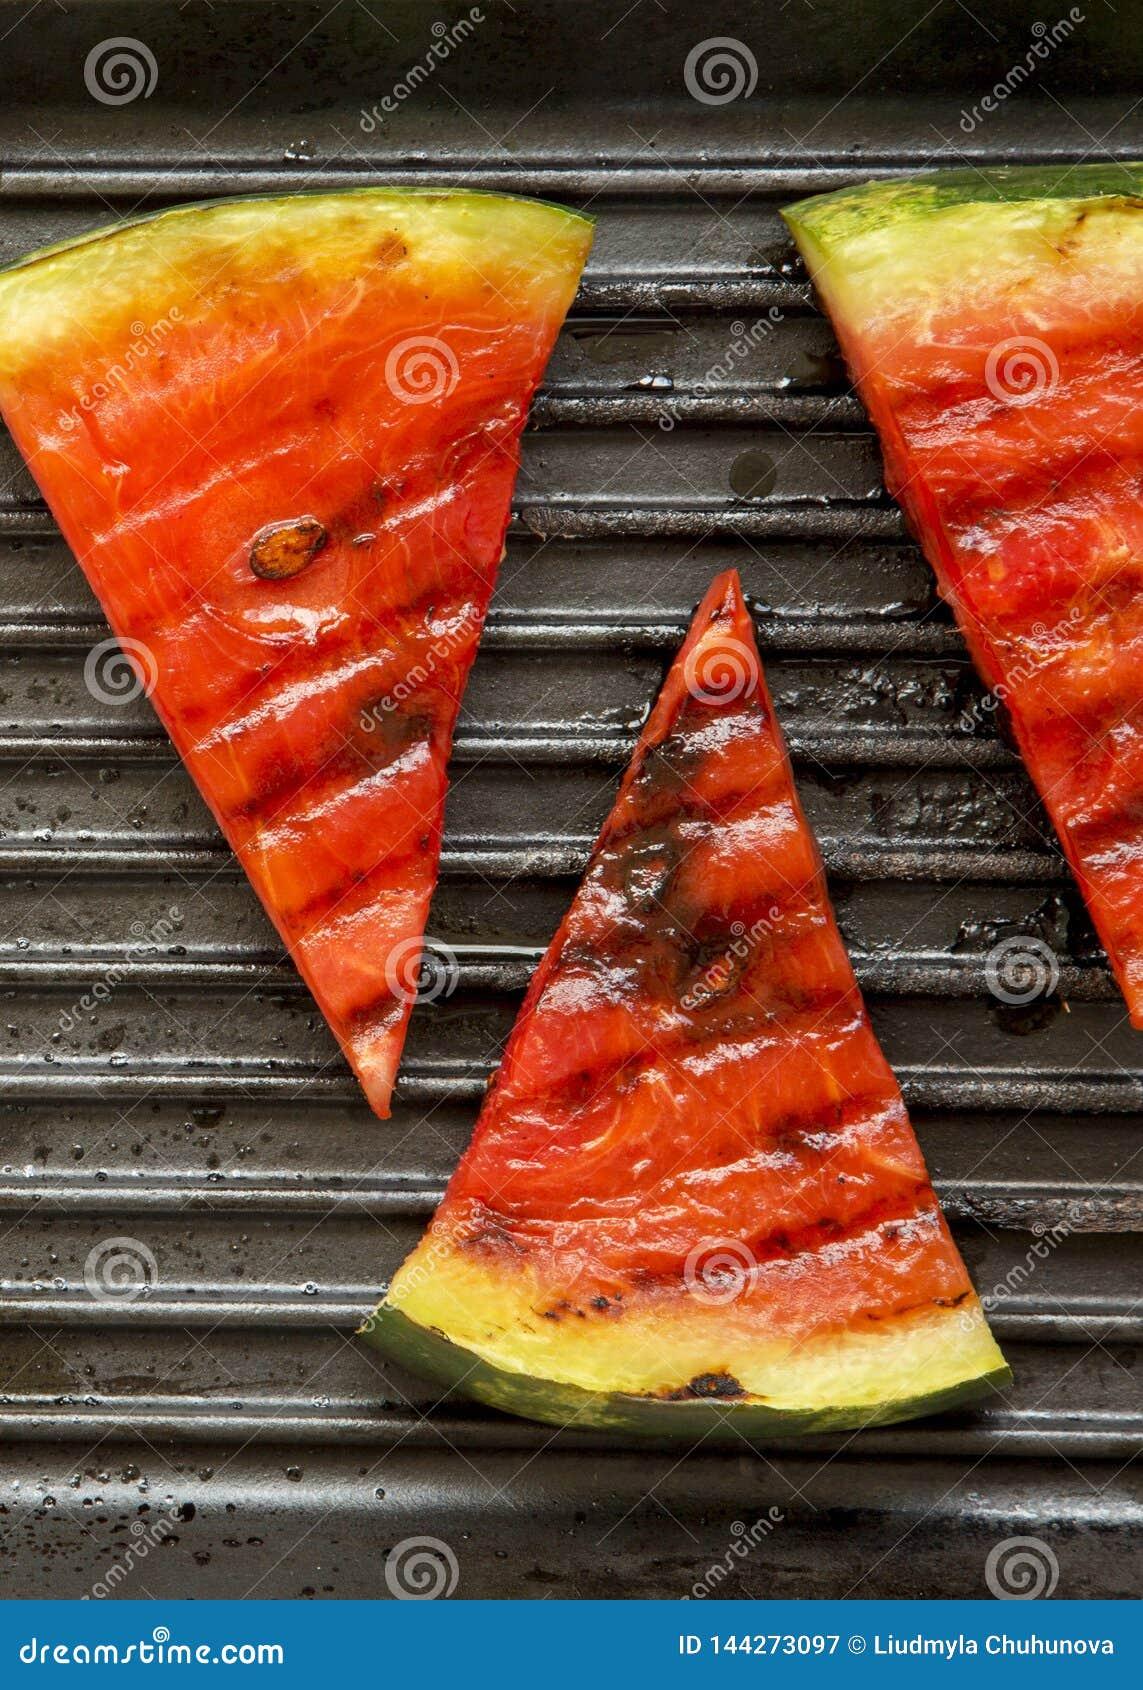 Rebanadas de sand?a asada a la parrilla en el asado a la parilla de la cacerola, visi?n superior Fruta sana del verano Primer